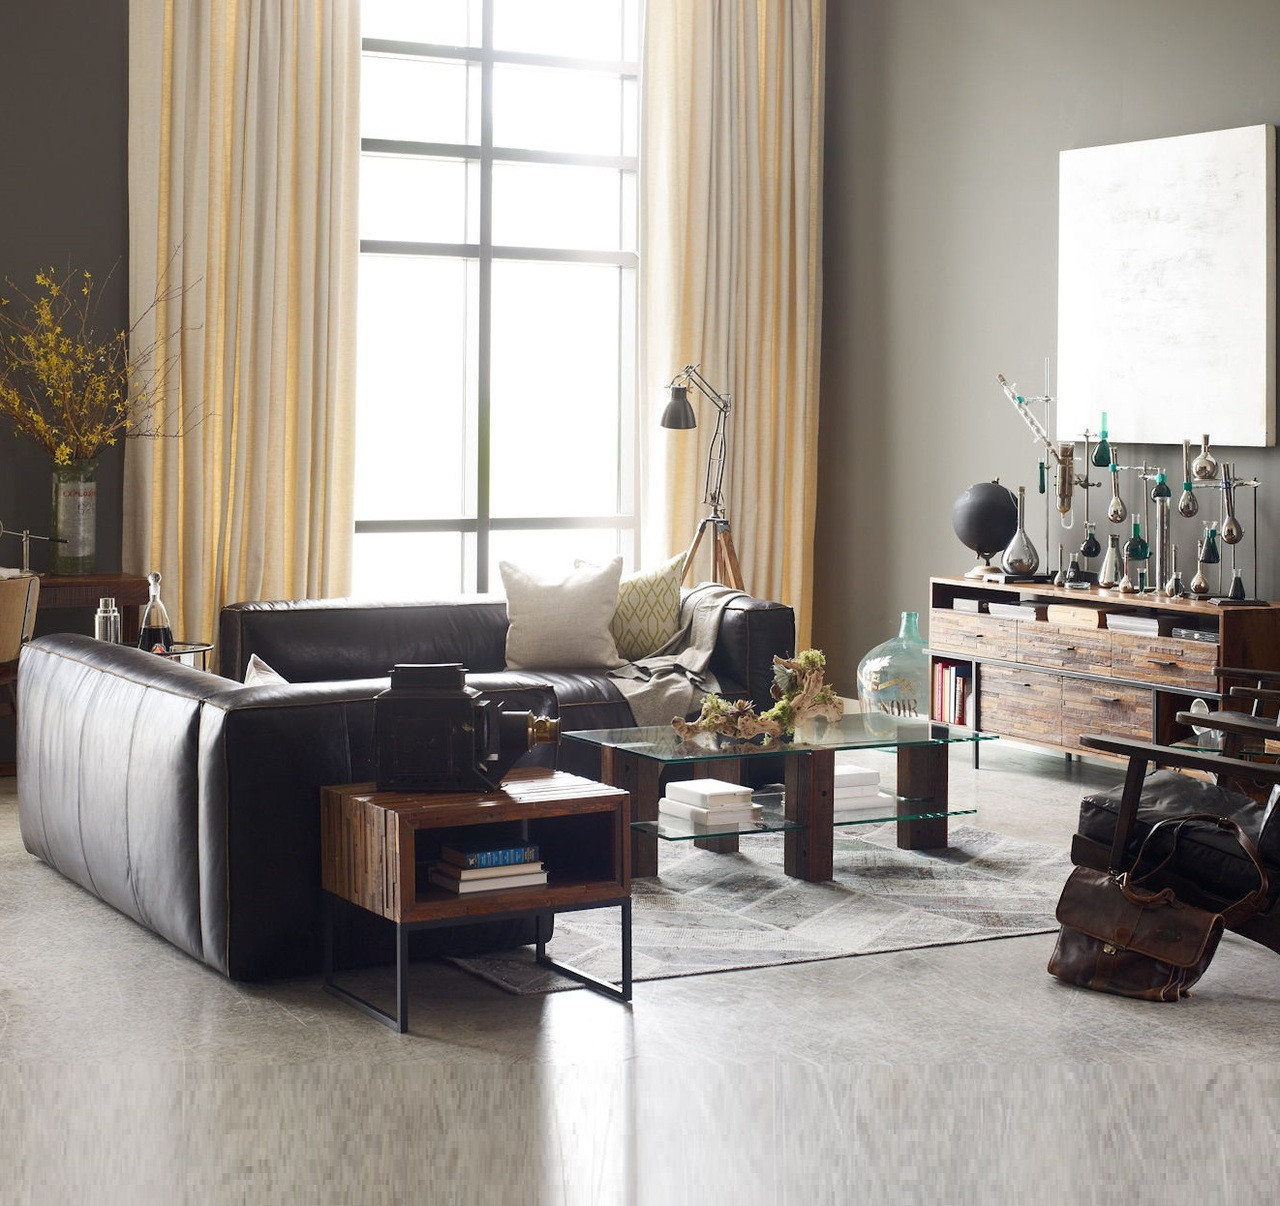 Leather Sectional Sofa Gta: Nolita Saddle Black Leather Modular Sectional Sofa